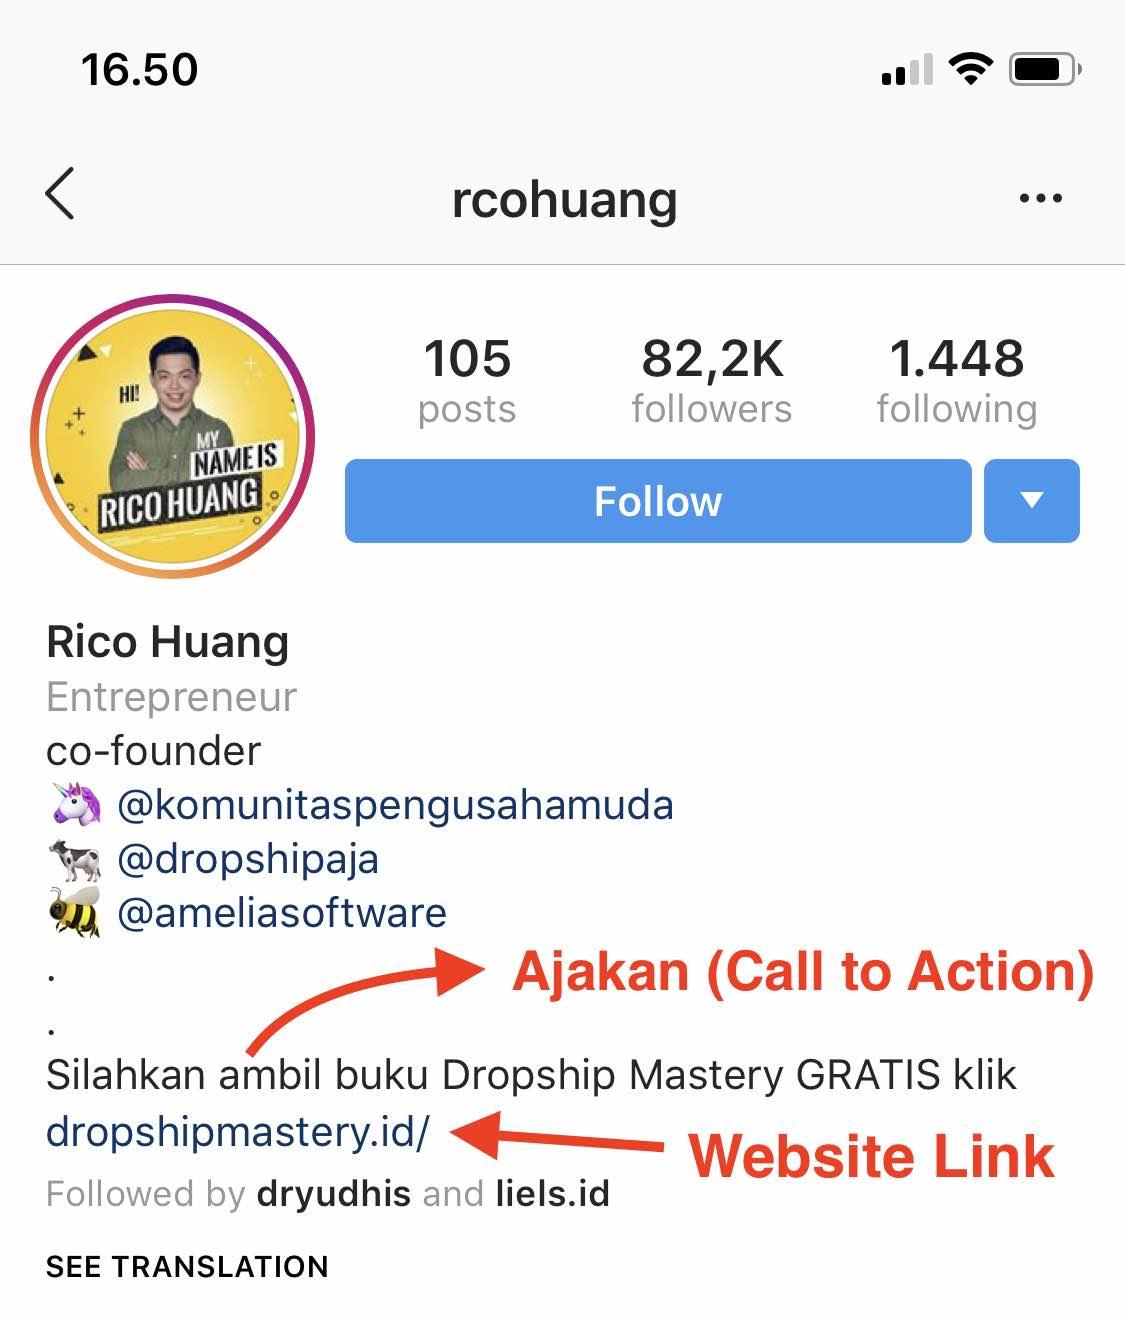 Contoh Kata Kata Bio Instagram Yang Menarik Followers